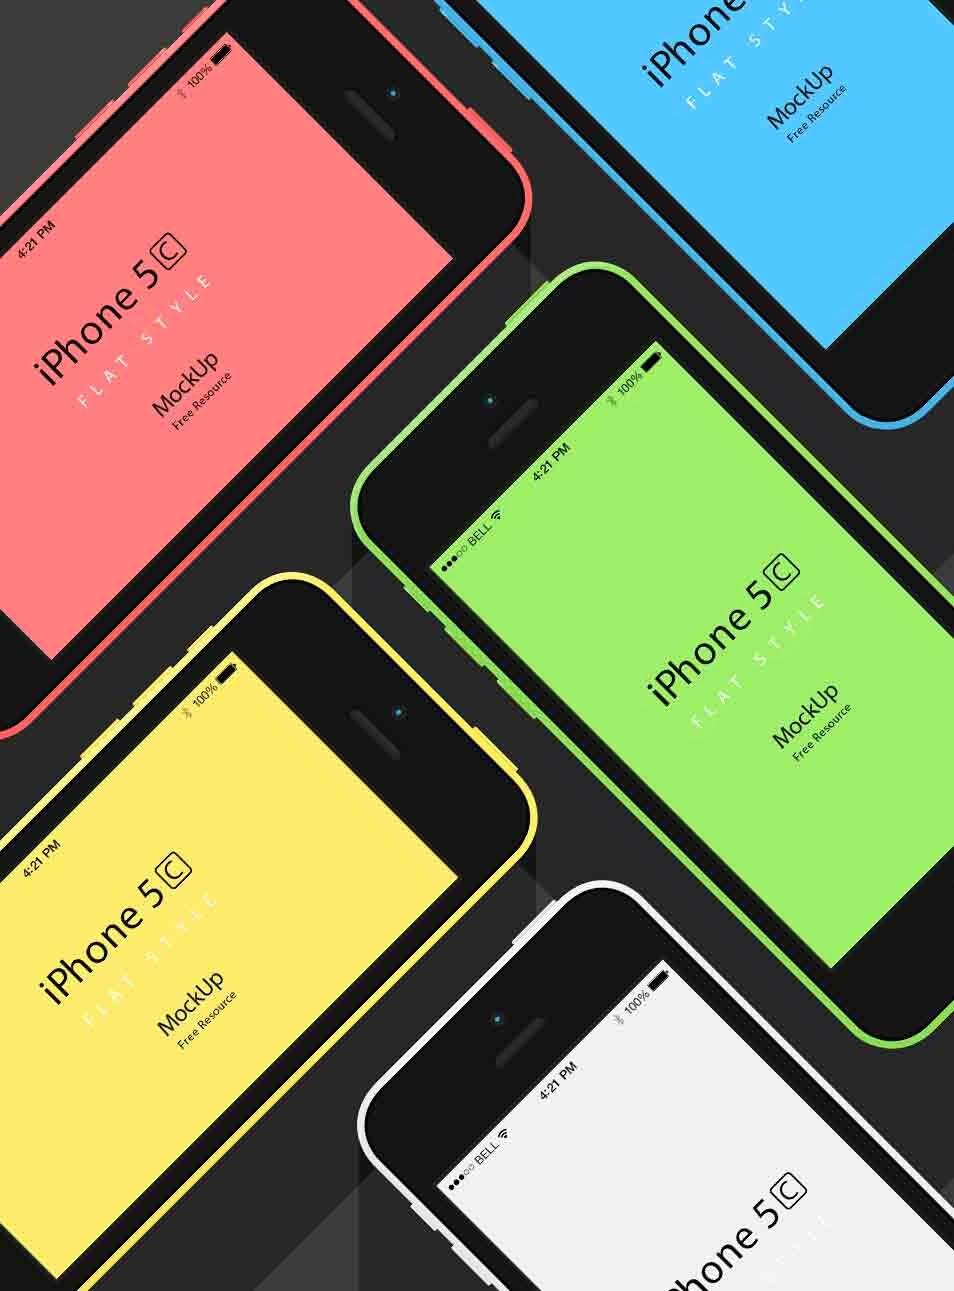 iPhone 5C Flat Mockup PSD Template